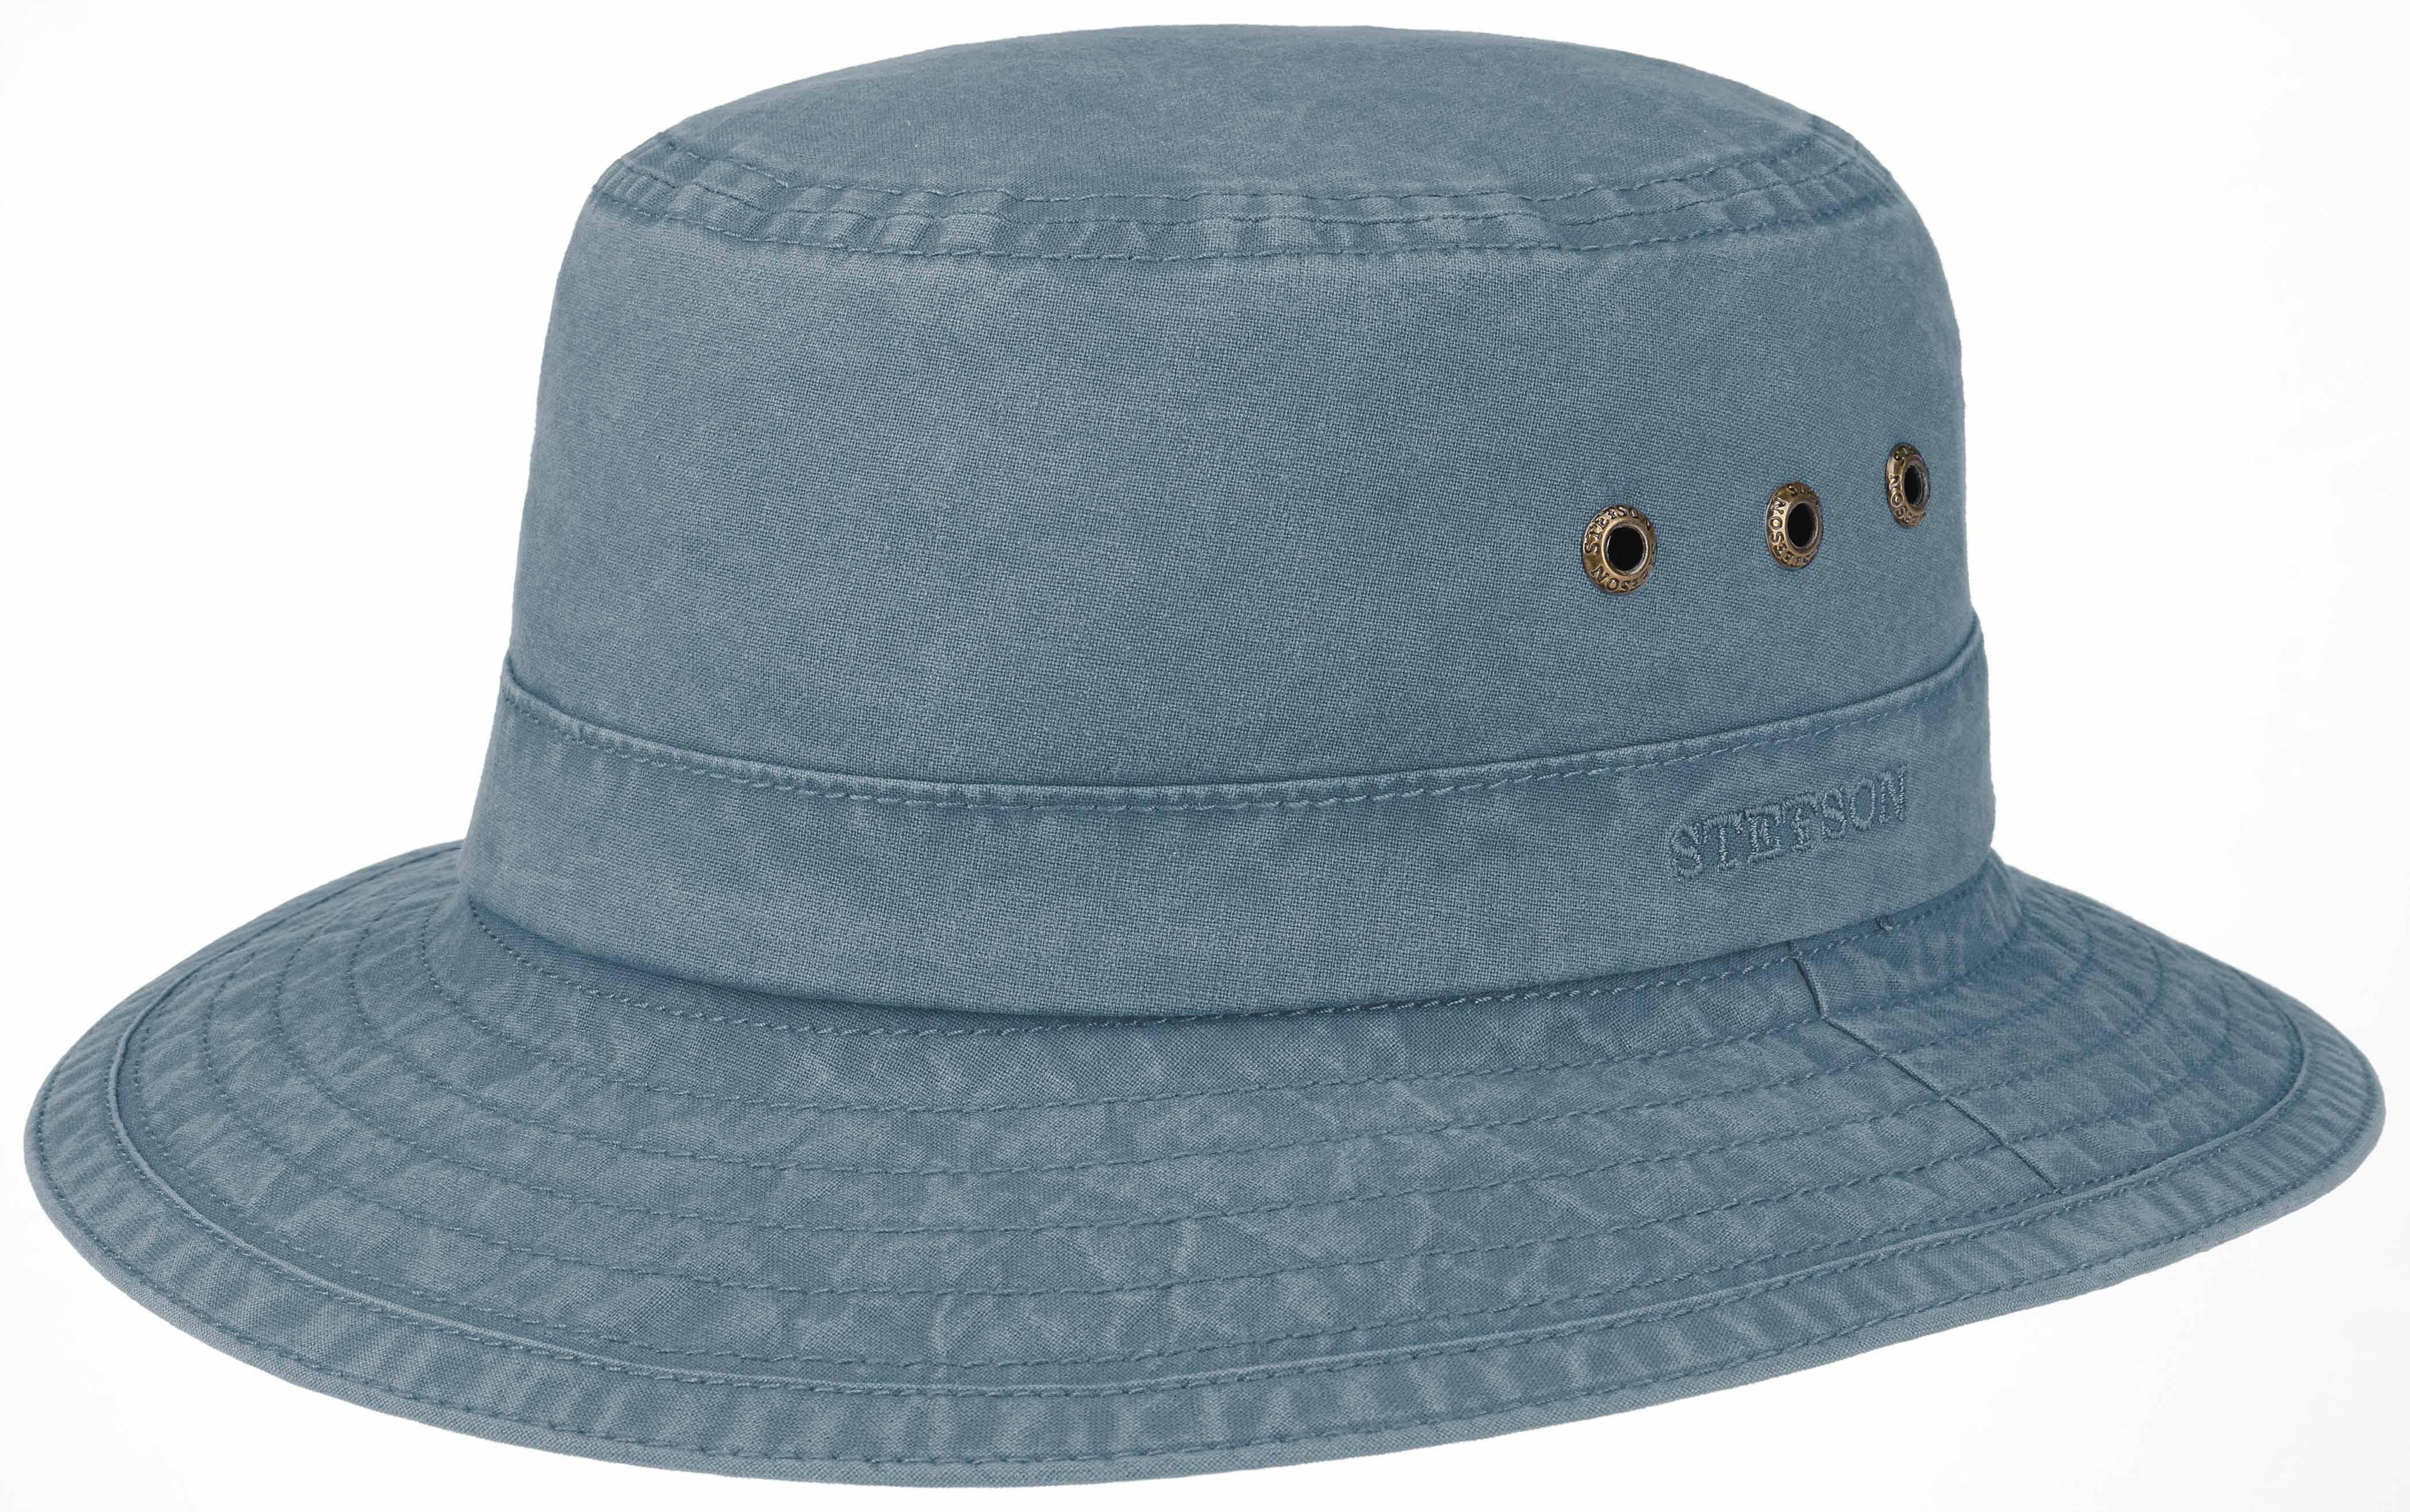 Stetson - Stetson Bucket Delave Organic Cotton UV Protection Navy Hat